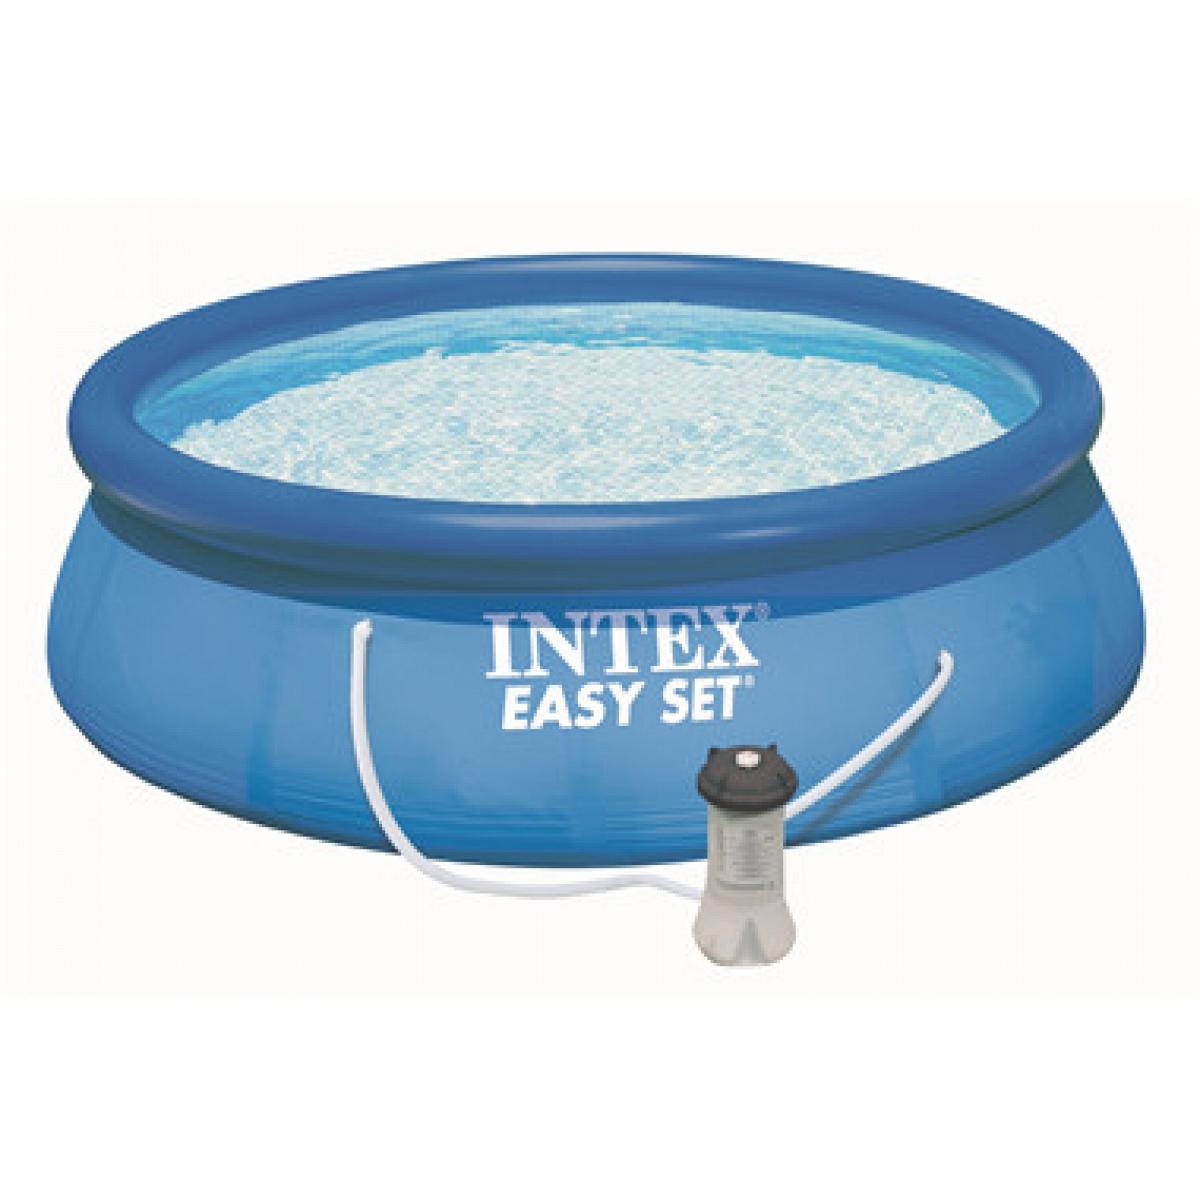 Piscina tonda intex fuoriterra 305x76 mod easy set intex - Filtri per piscine fuori terra ...